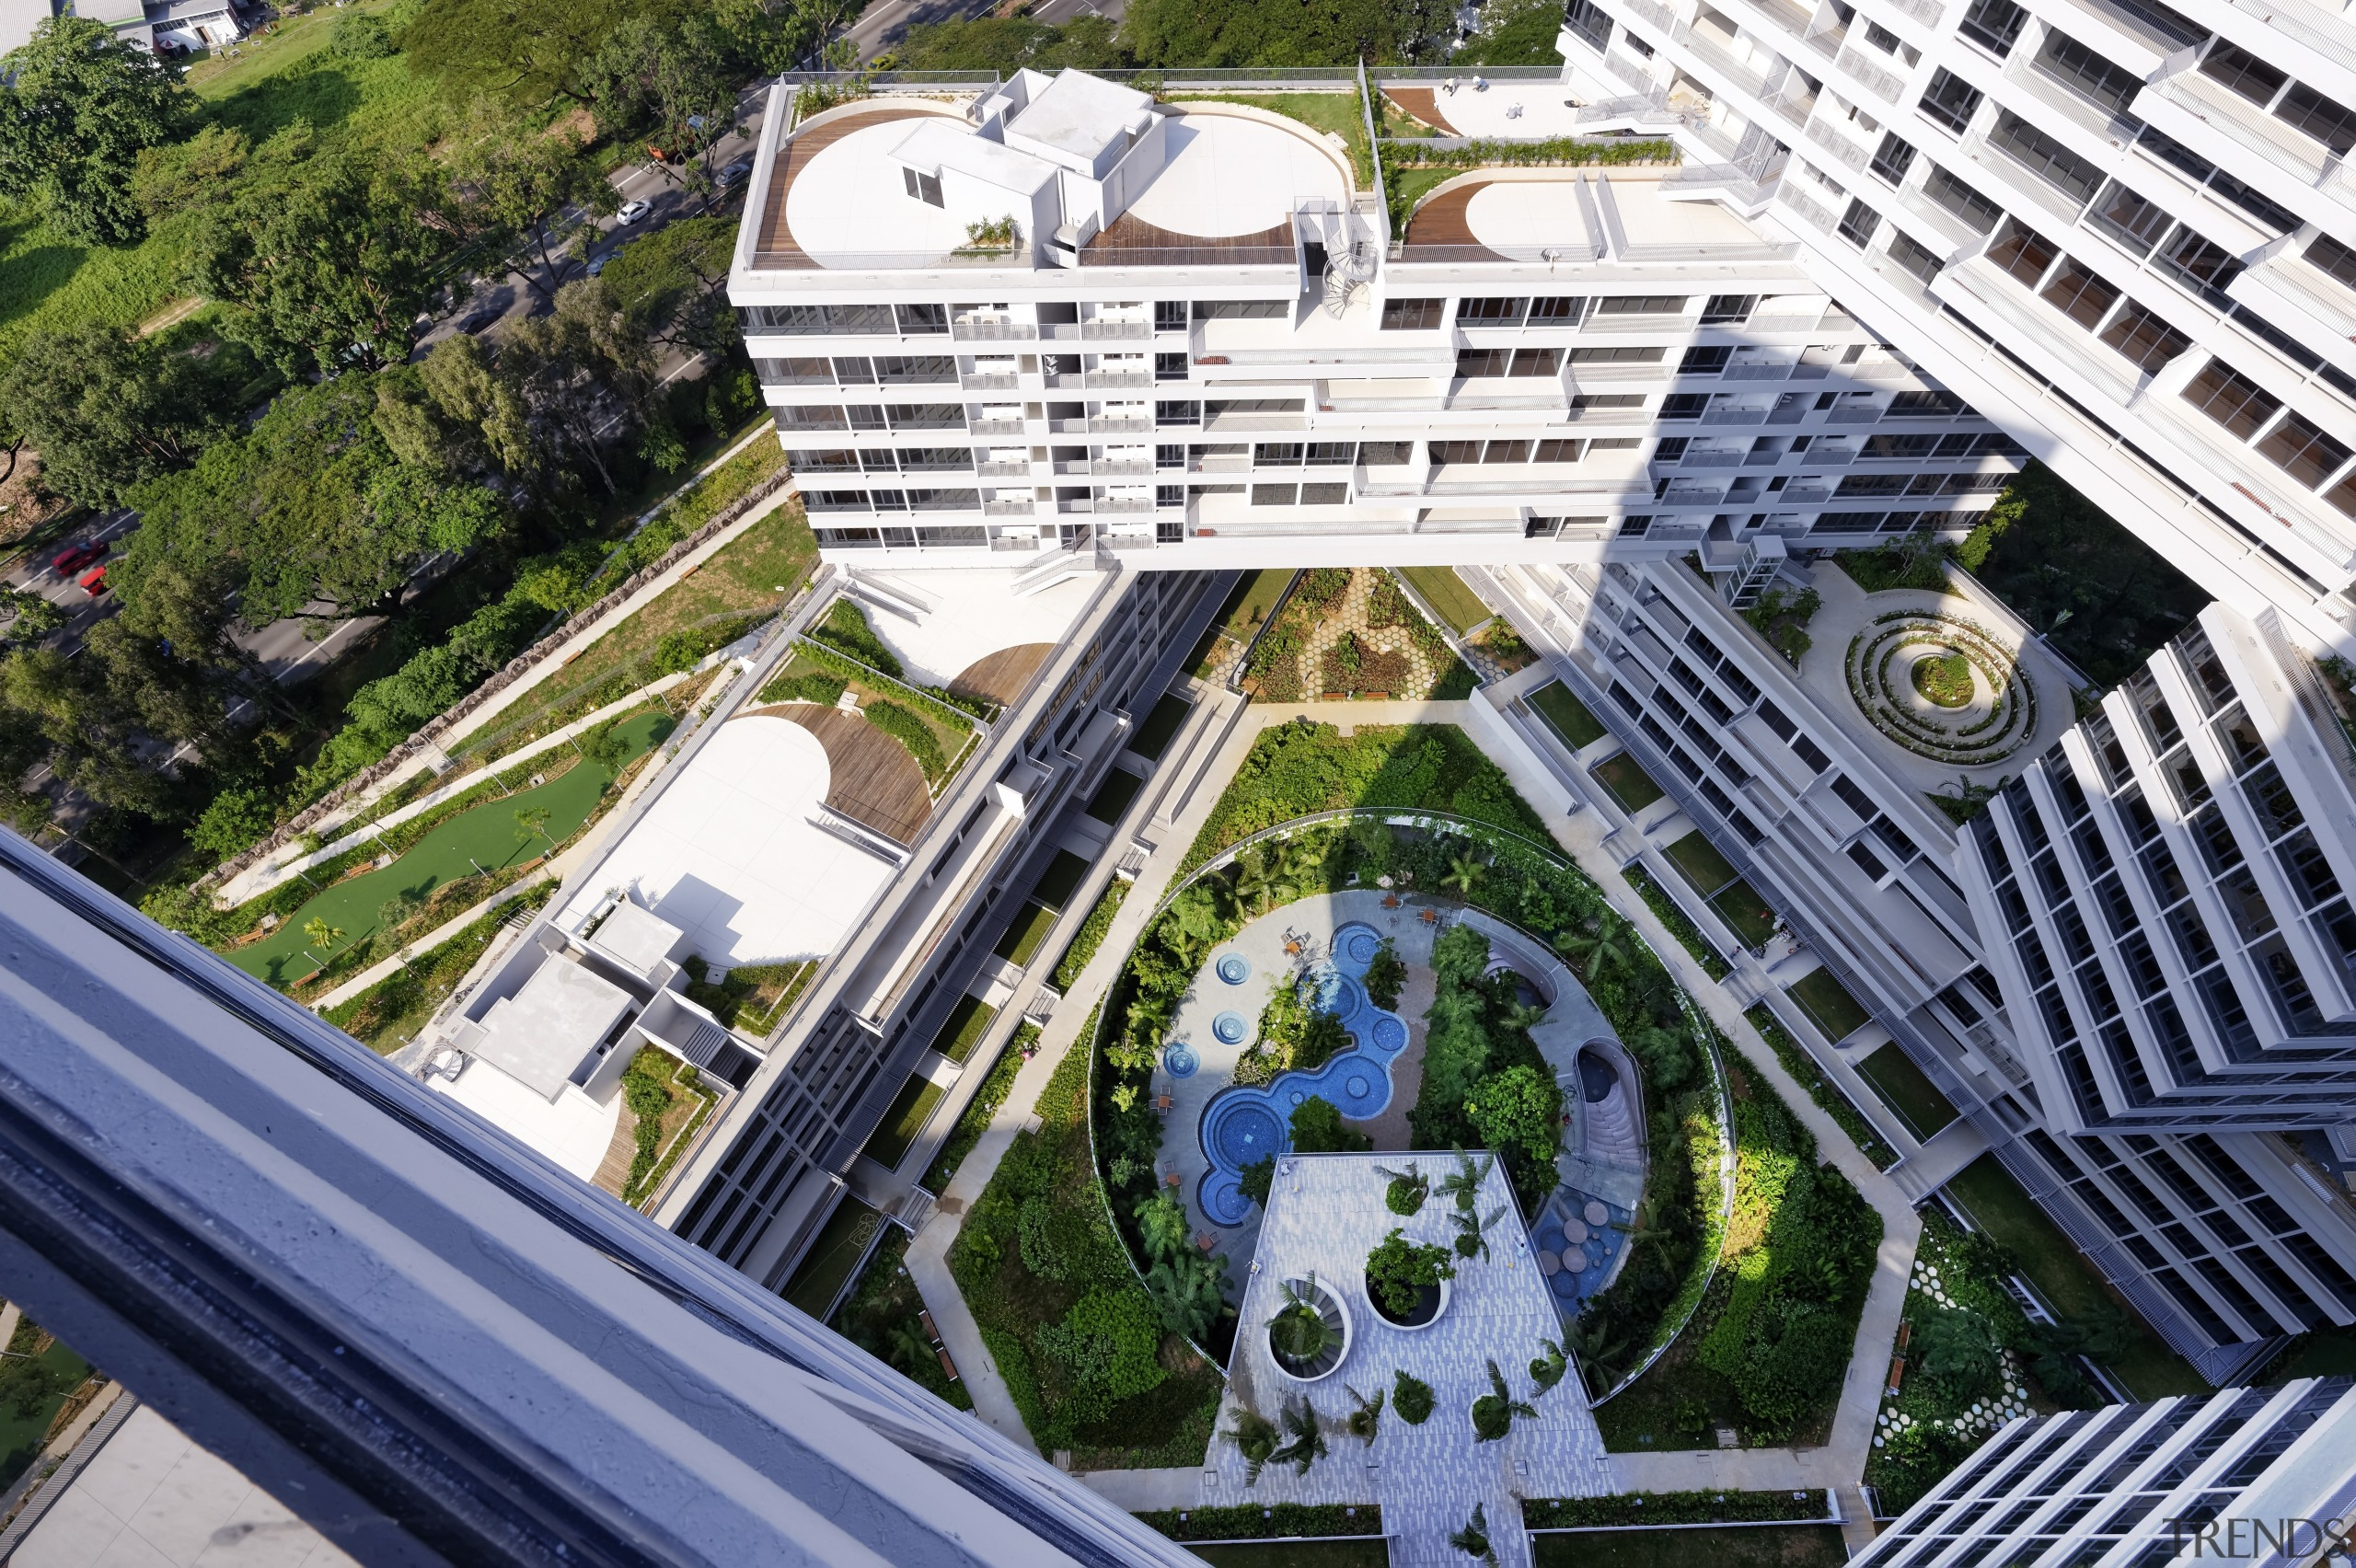 The buildings in The Interlace apartment complex wrap architecture, building, city, condominium, metropolis, metropolitan area, mixed use, neighbourhood, real estate, residential area, urban area, urban design